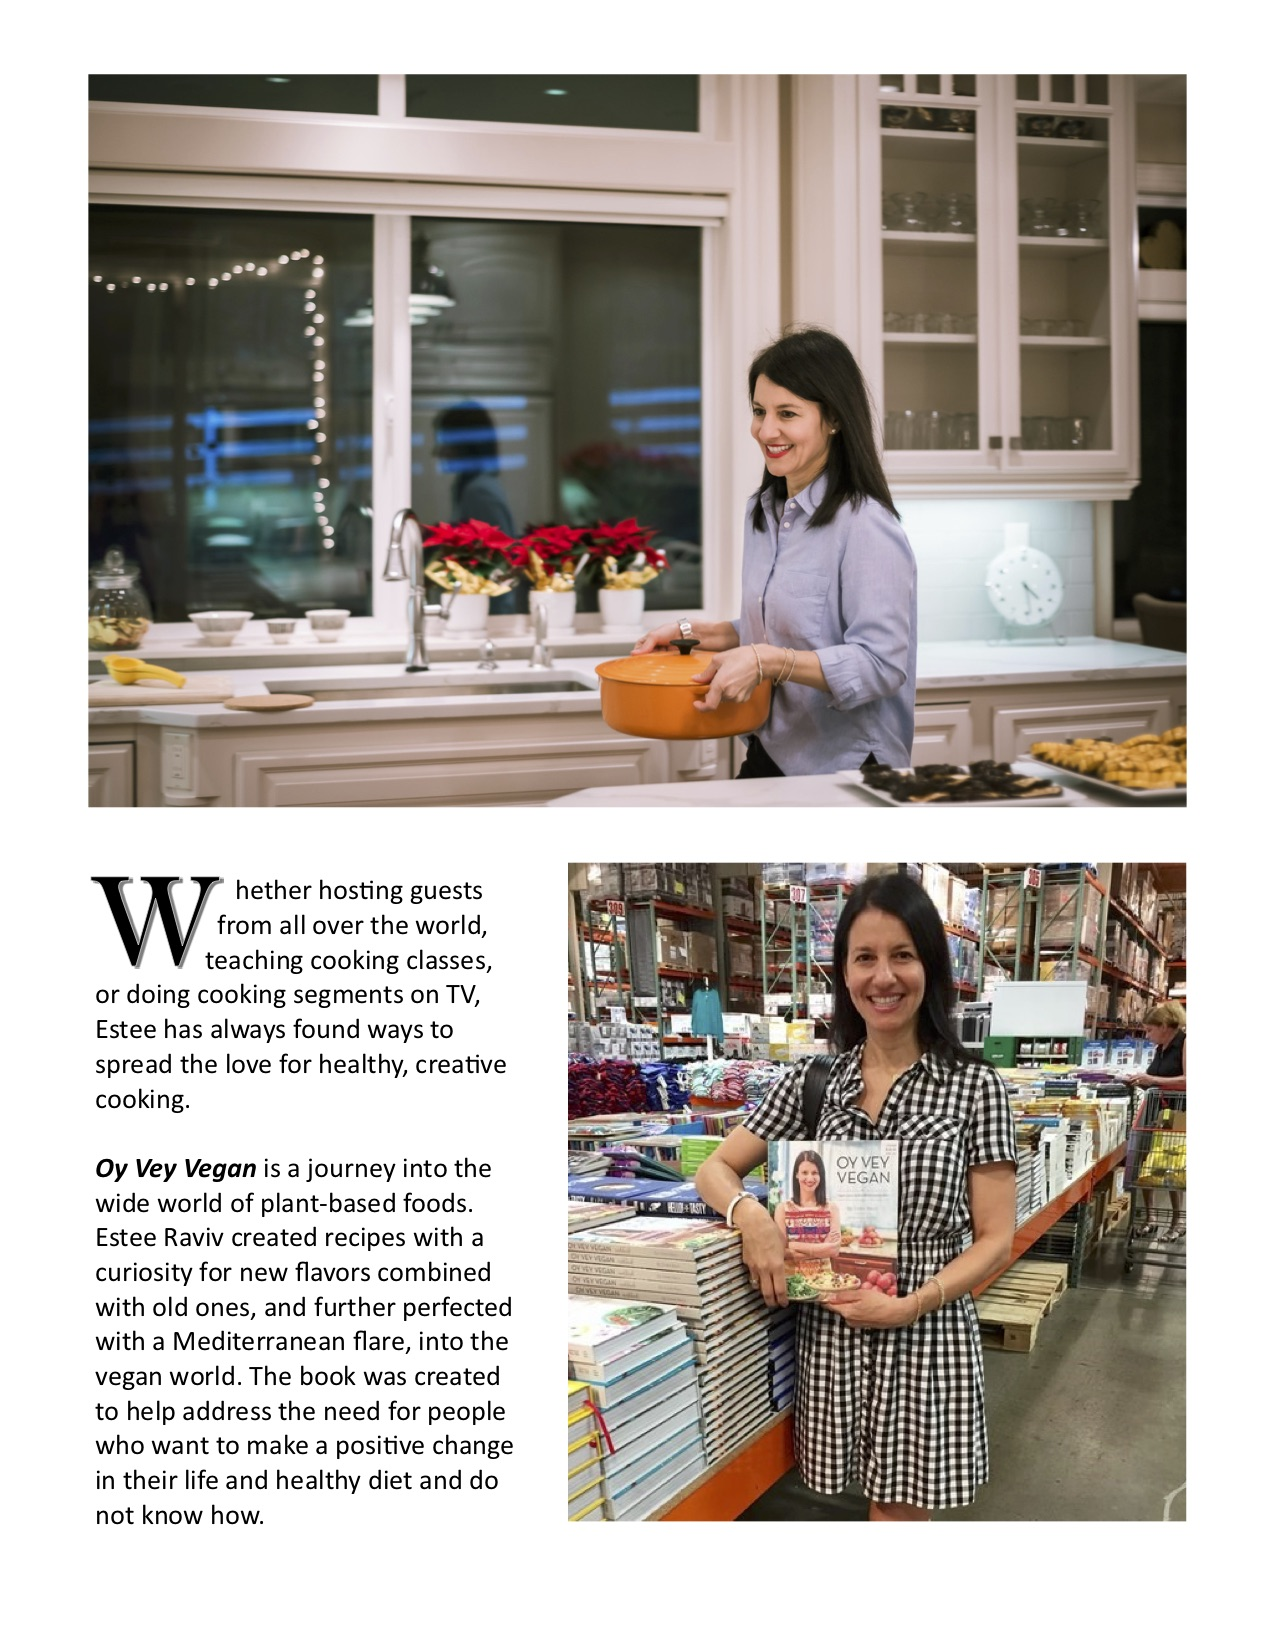 Estee Vegan Lifestyle Magazine Article pg 3.jpg